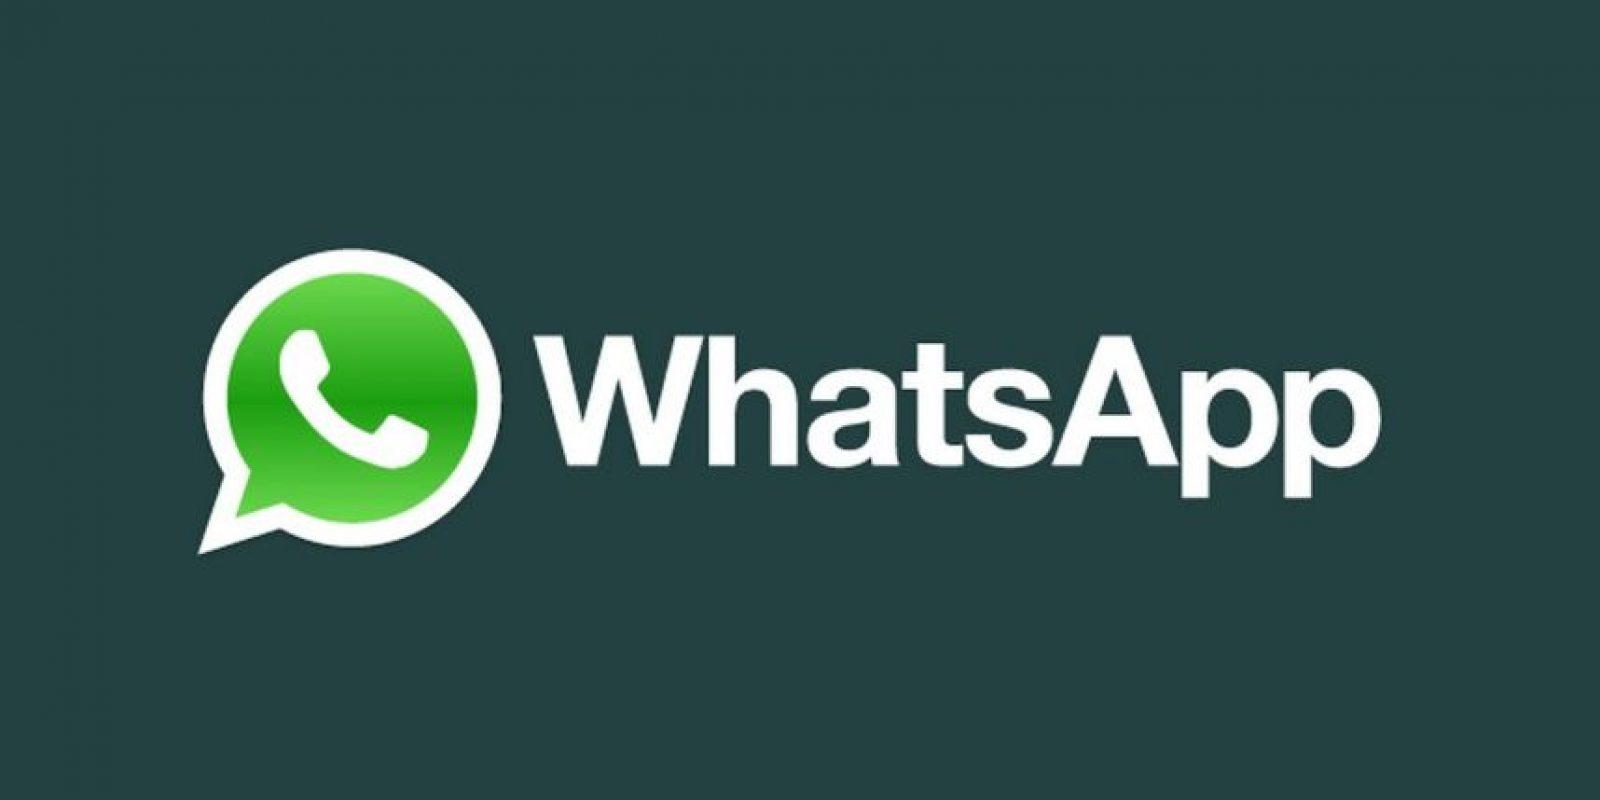 WhatsAppp – Jan Koum Foto:WhatsAppp